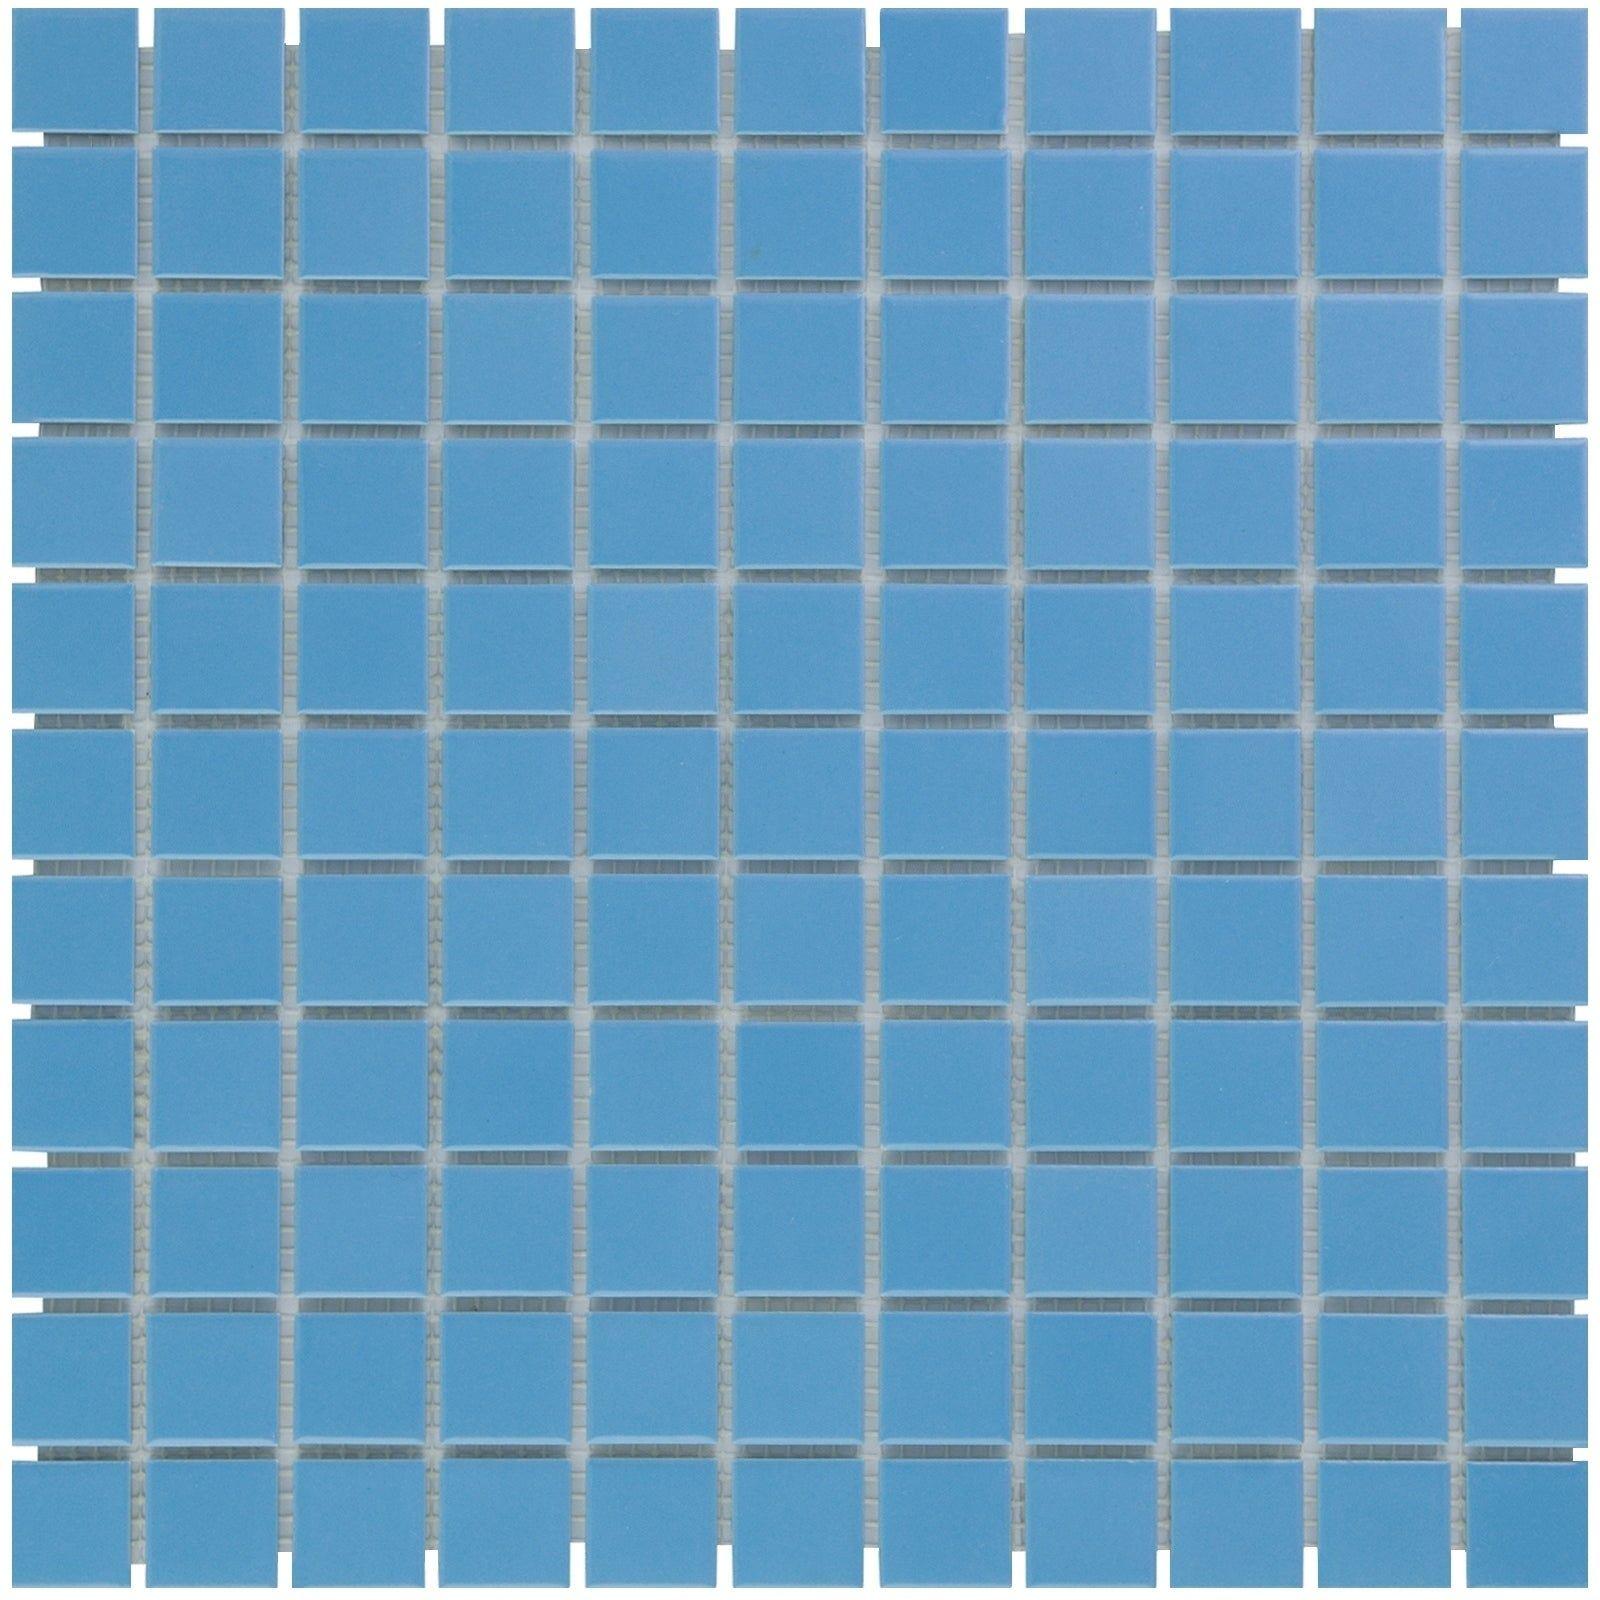 Glazed Porcelain Mosaic Tile Sheet Barcelona 1 X1 Square Glossy Blue Case Of 10 Sheets 9 7 Sq Ft 12 X 12 Ceramic Mosaic Tile Sheets Mosaic Tiles Tile Installation